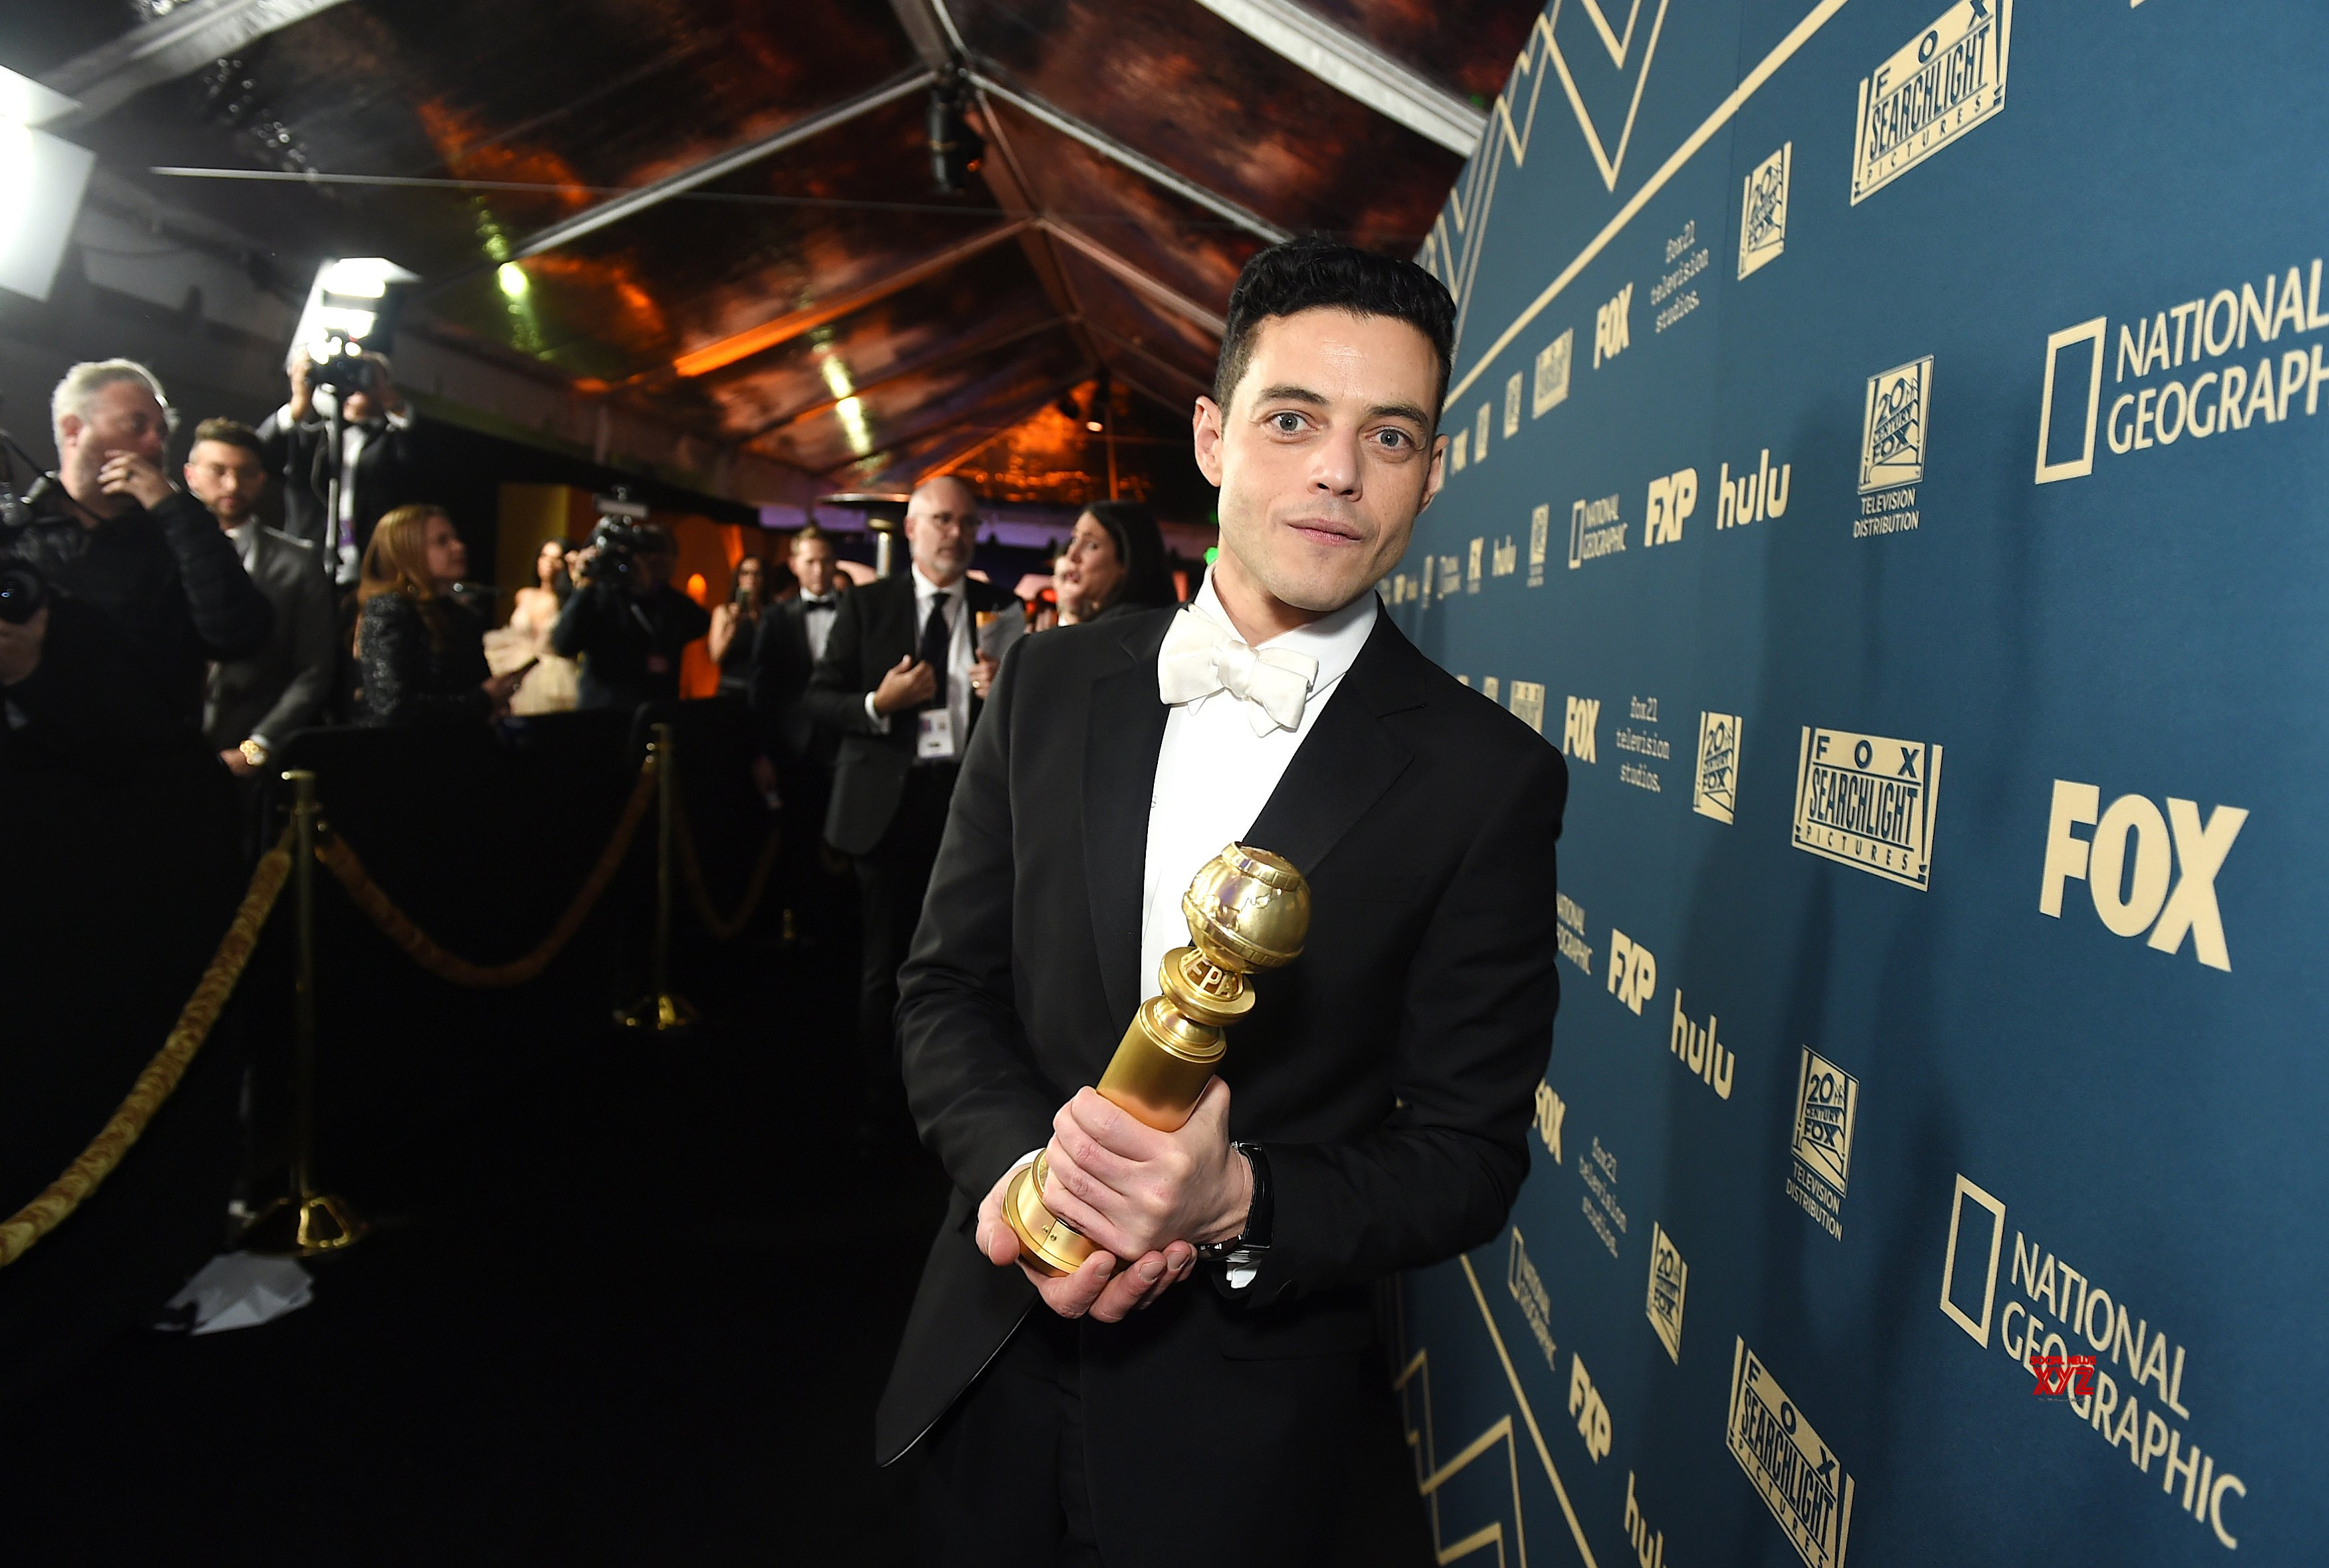 Bohemian Rhapsody Movie Team At Golden Globes Fox Party HD